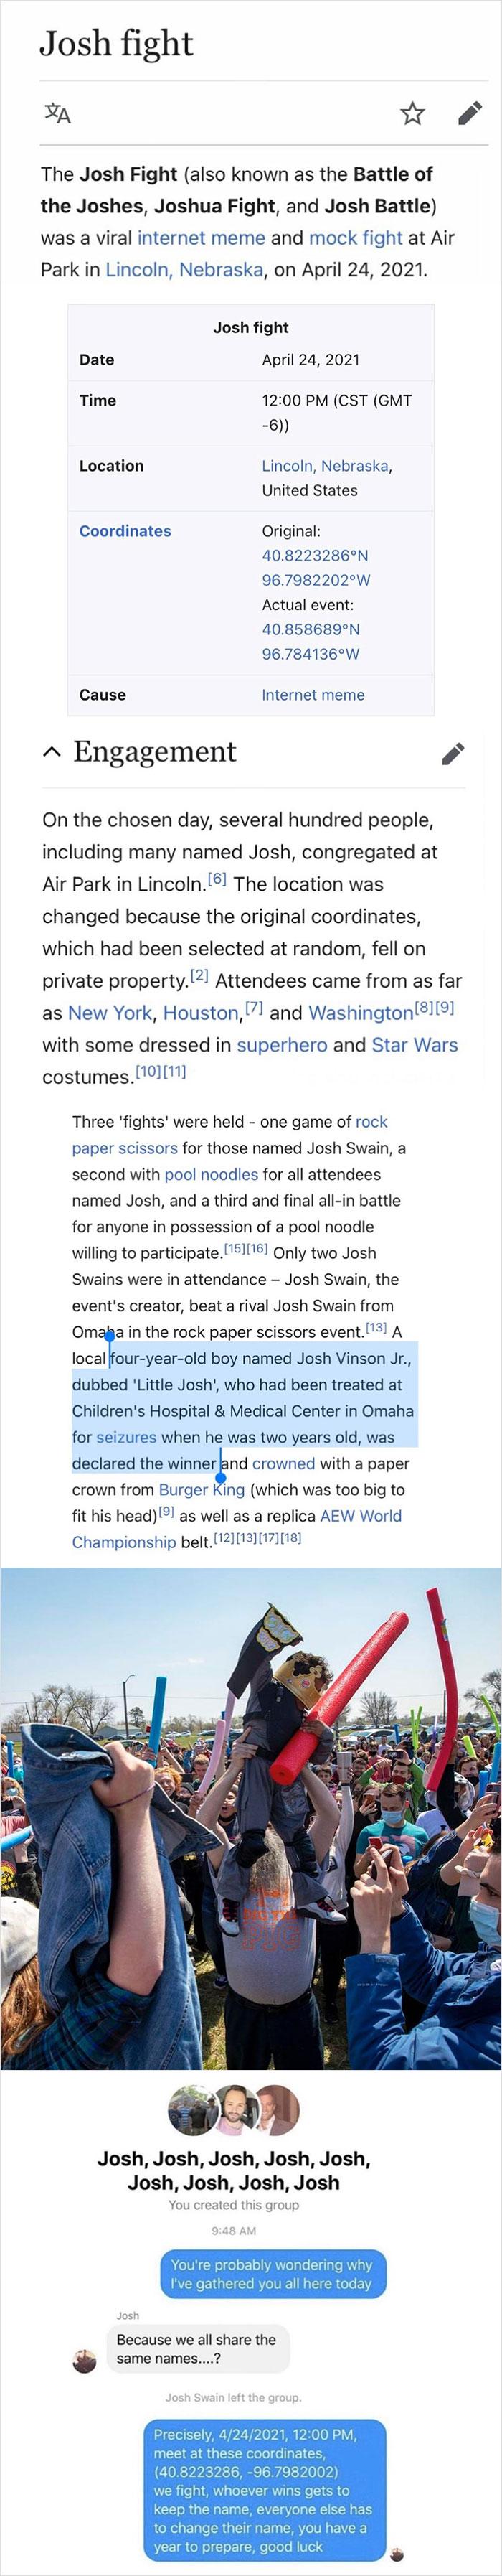 Rigged, I Knew Josh Would Win